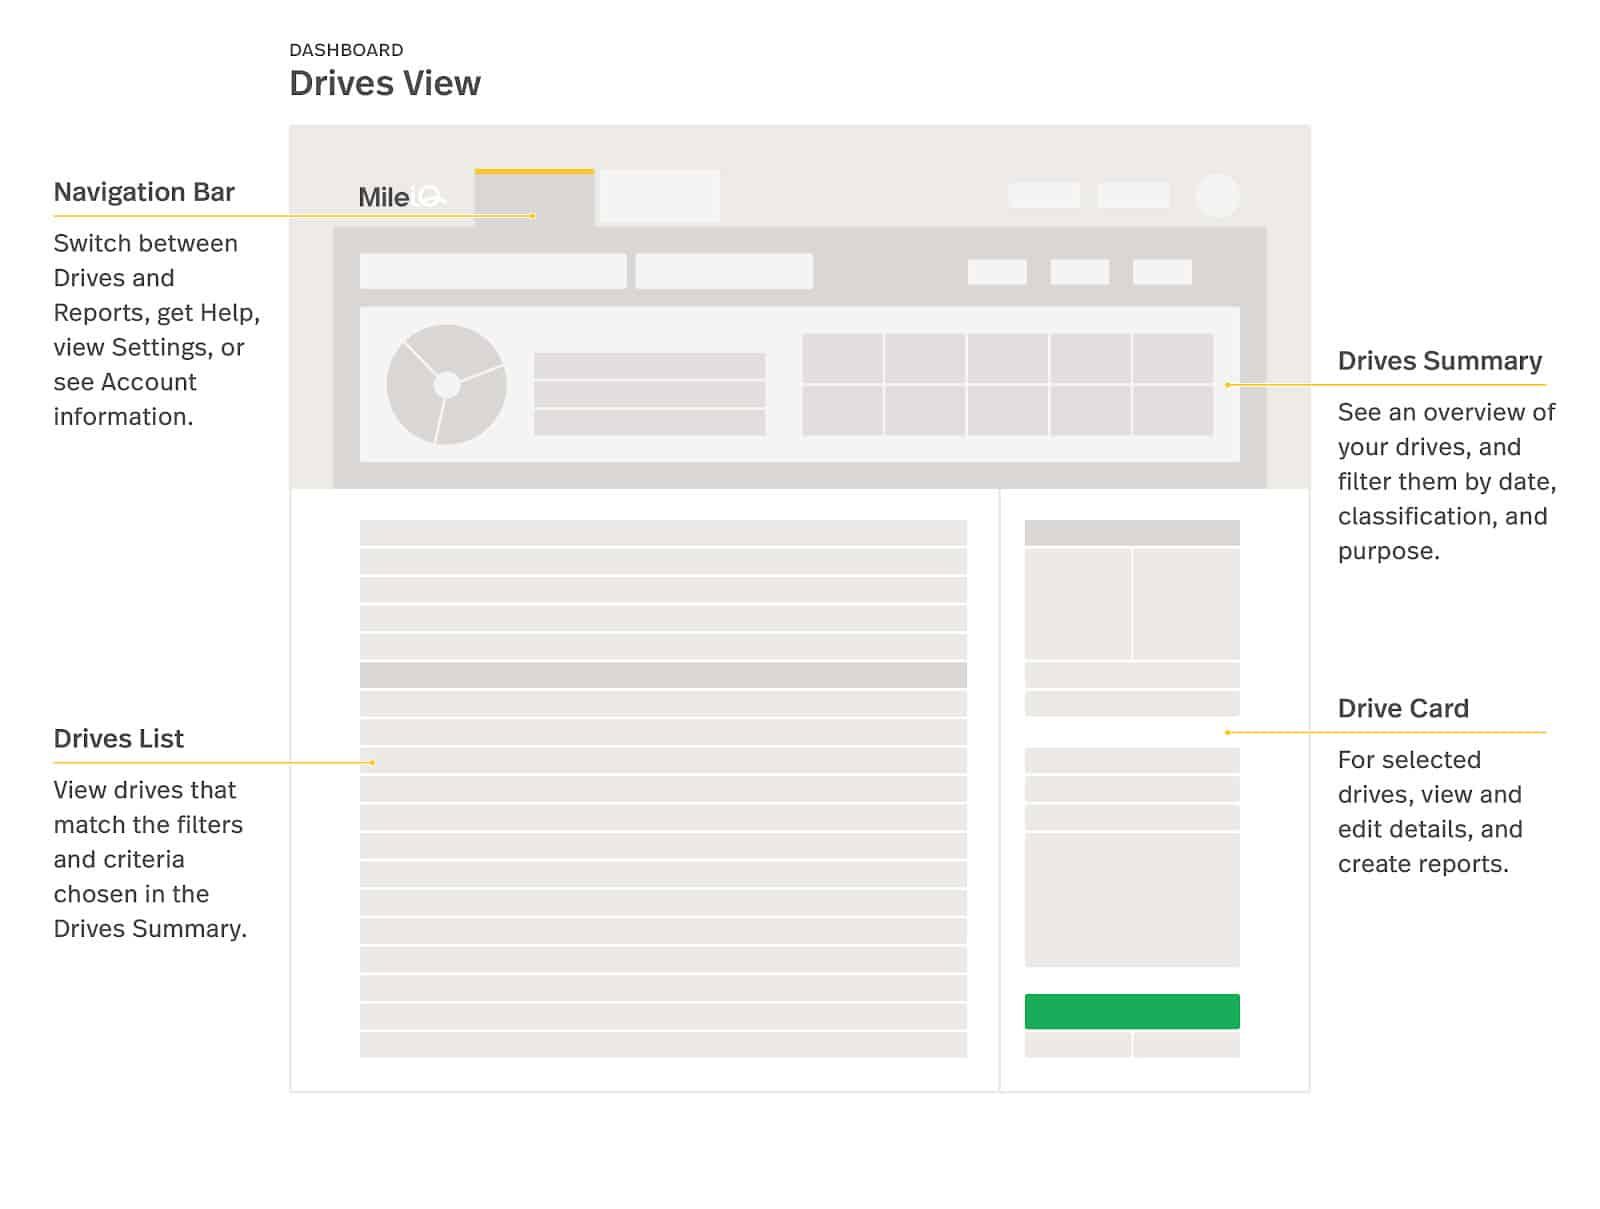 Screenshot of MileIQ The Drives View